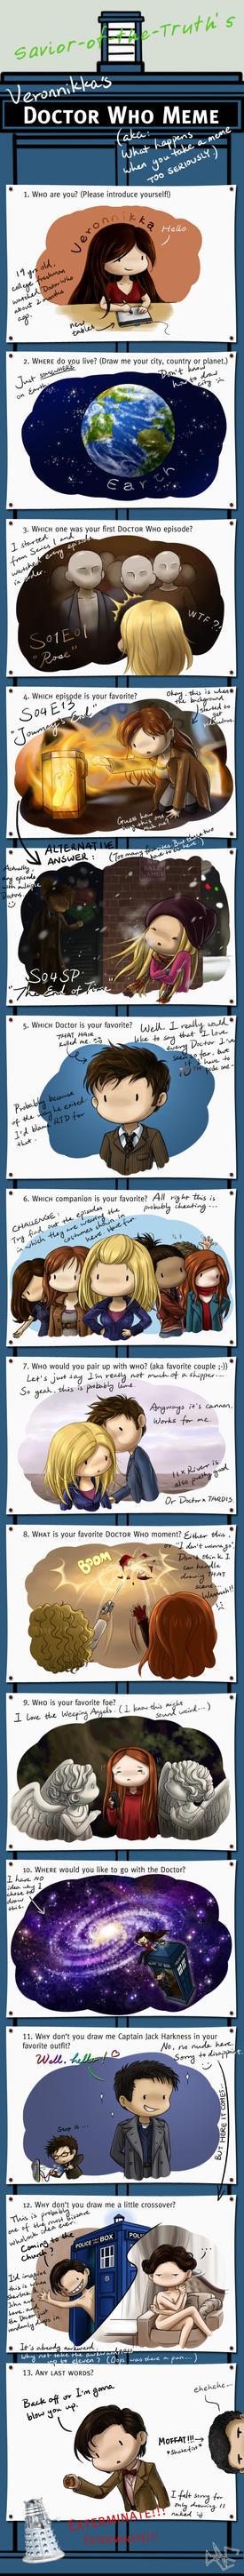 Doctor Who Meme by Veronnikka